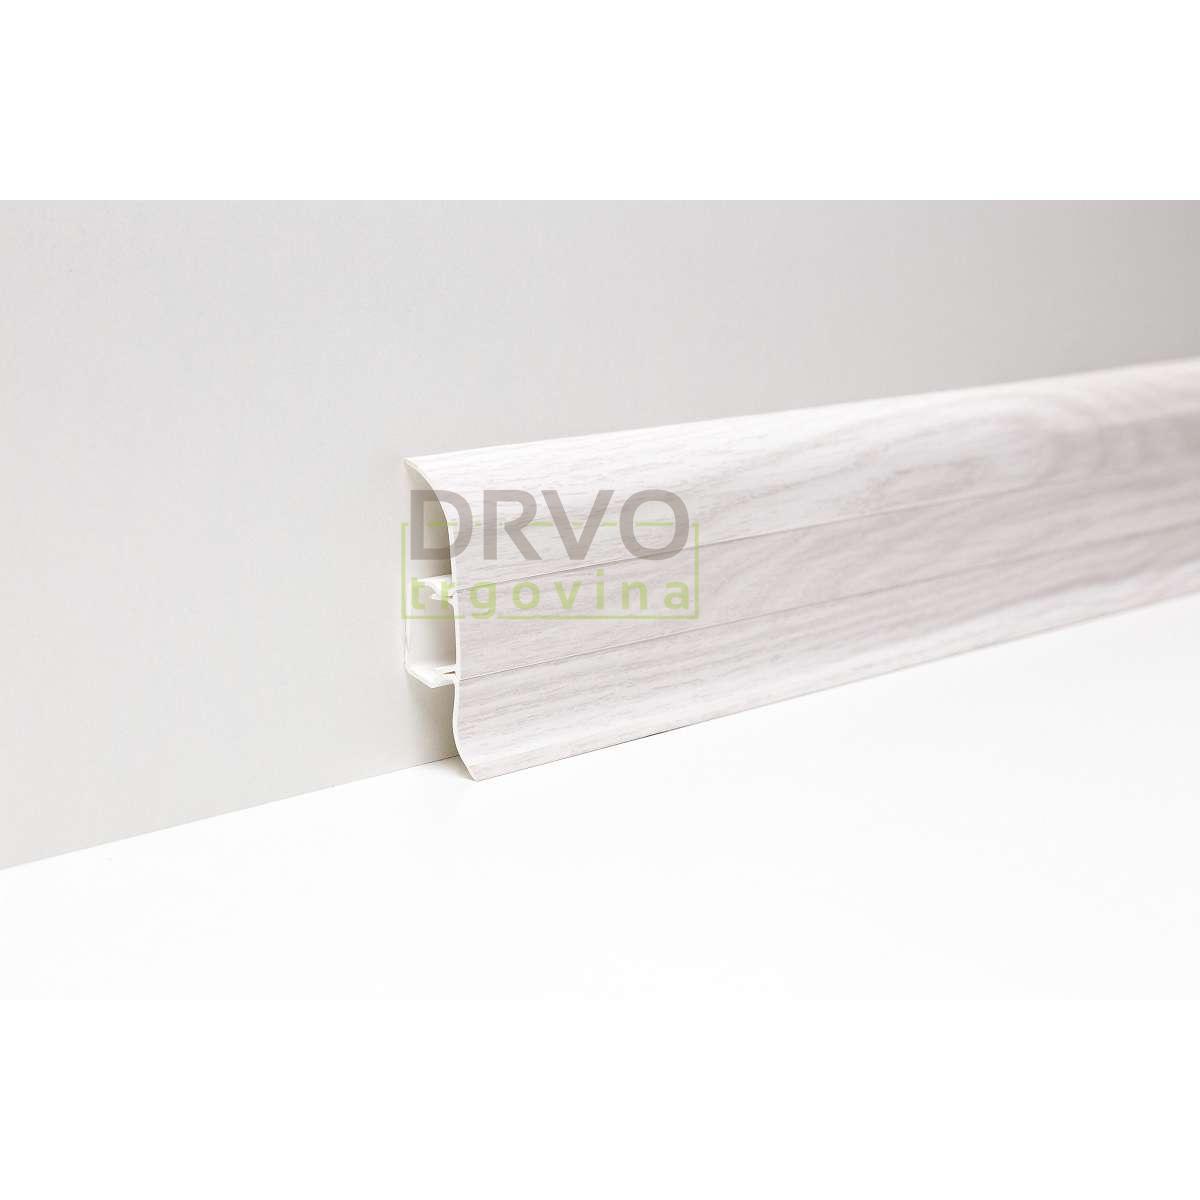 PVC LETVICA ZA LAMINAT P163 HRAST ASPEN/40128 2,5m